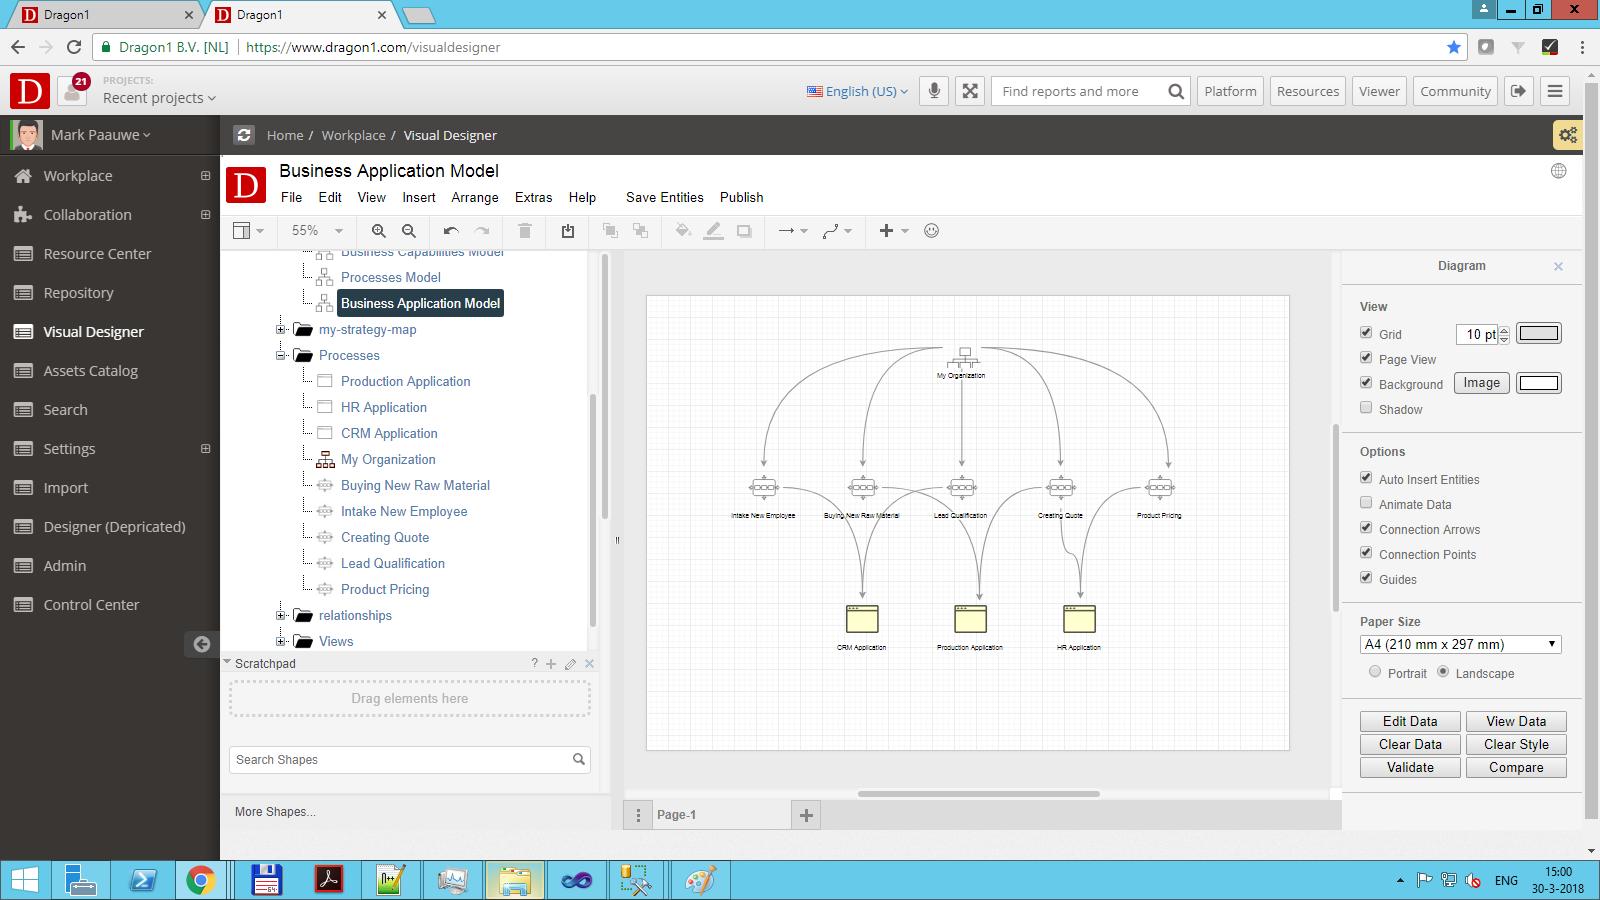 dragon1 model in repository